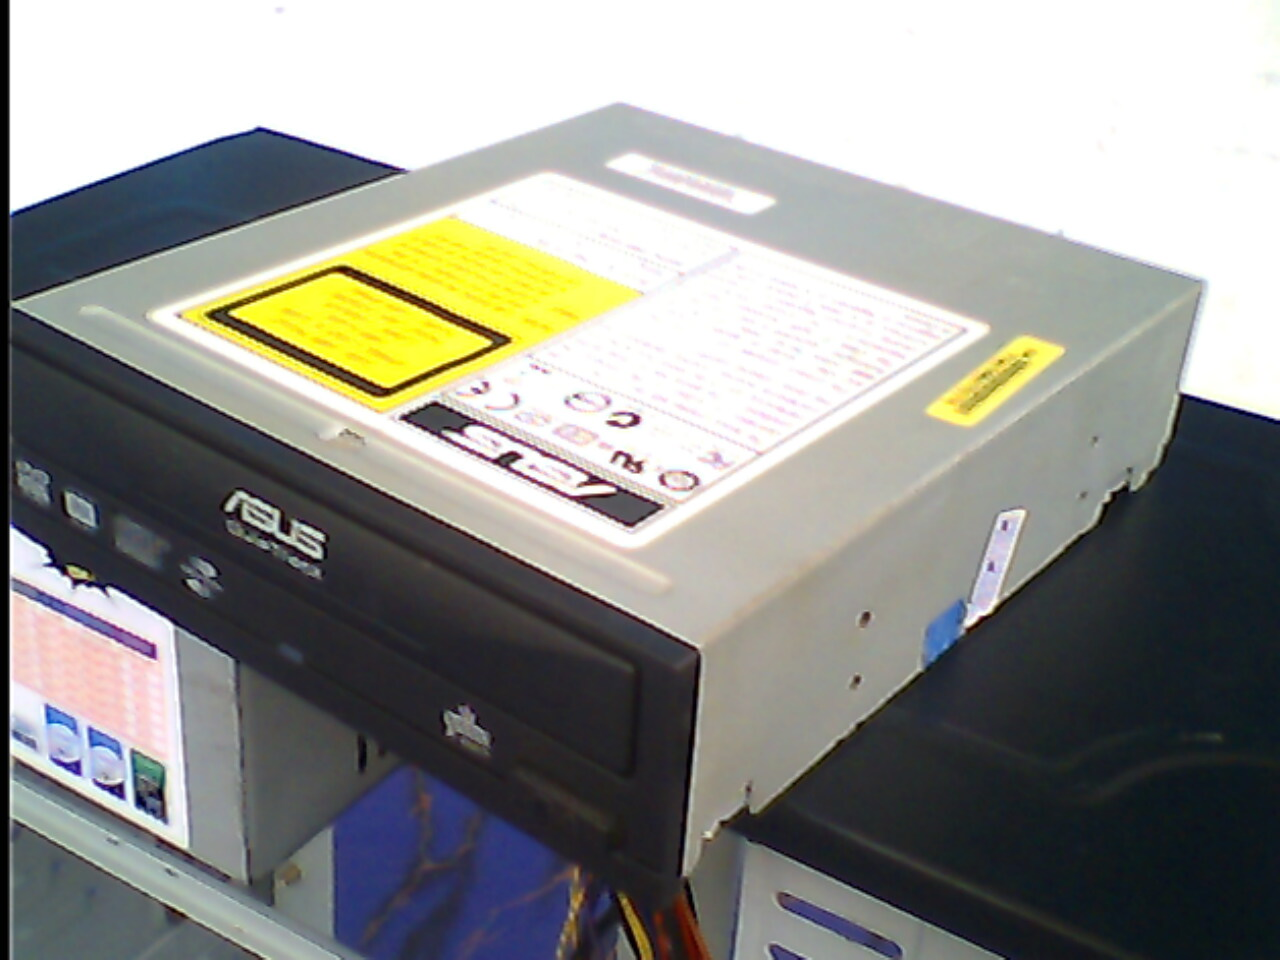 mengatur data komponen komputer lain